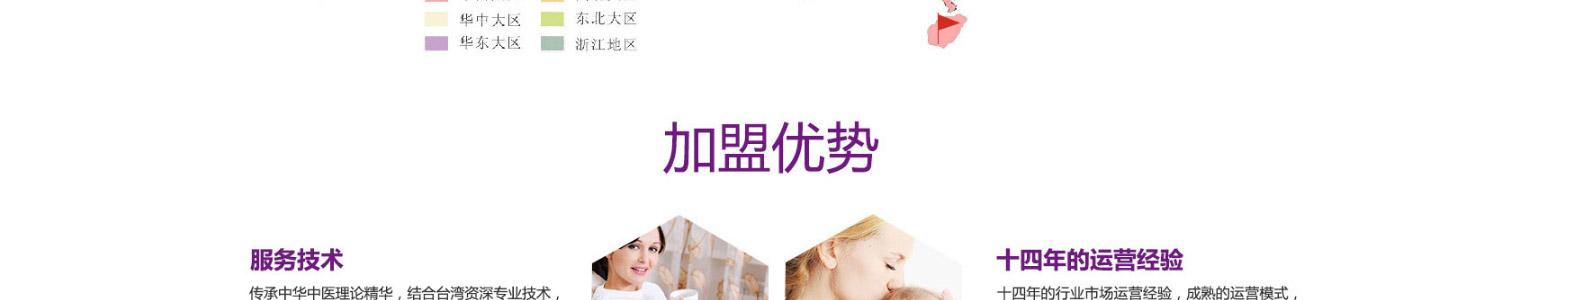 诗安国际母婴会所诗安国际母婴会所_14